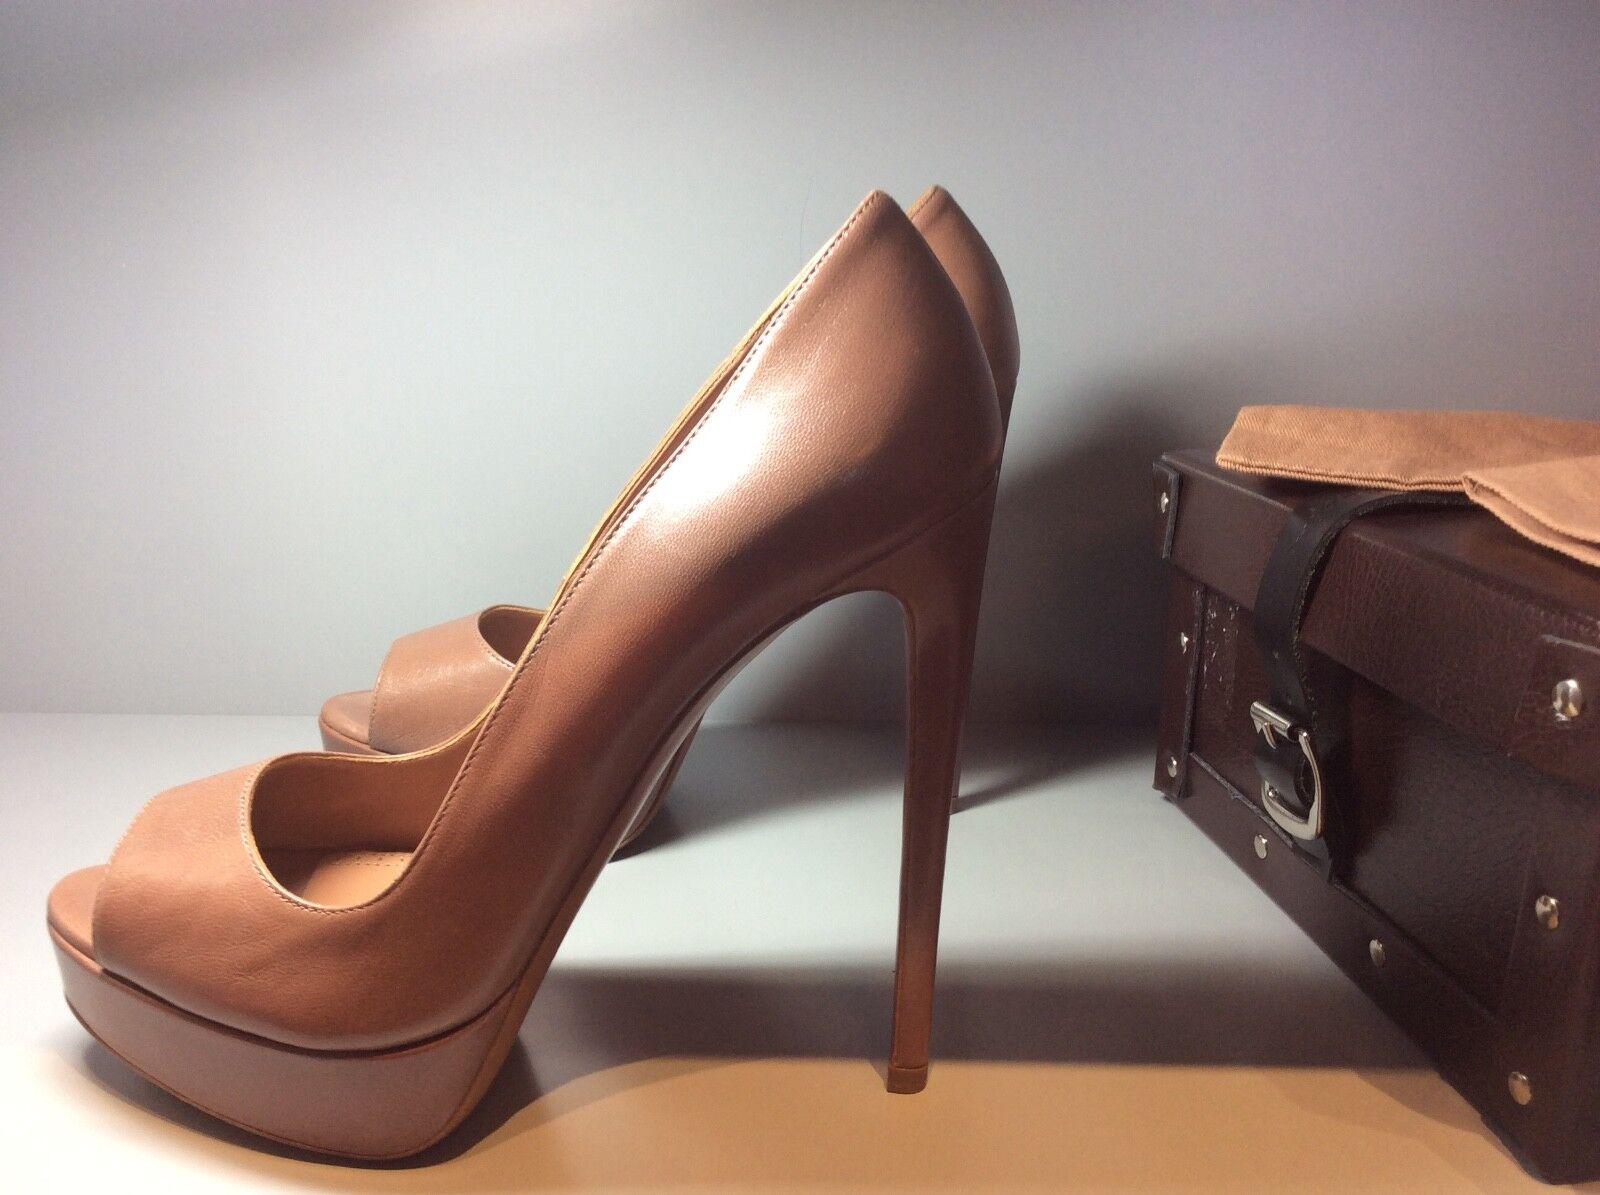 Descuento de liquidación Woman's Alaia high heels shoes